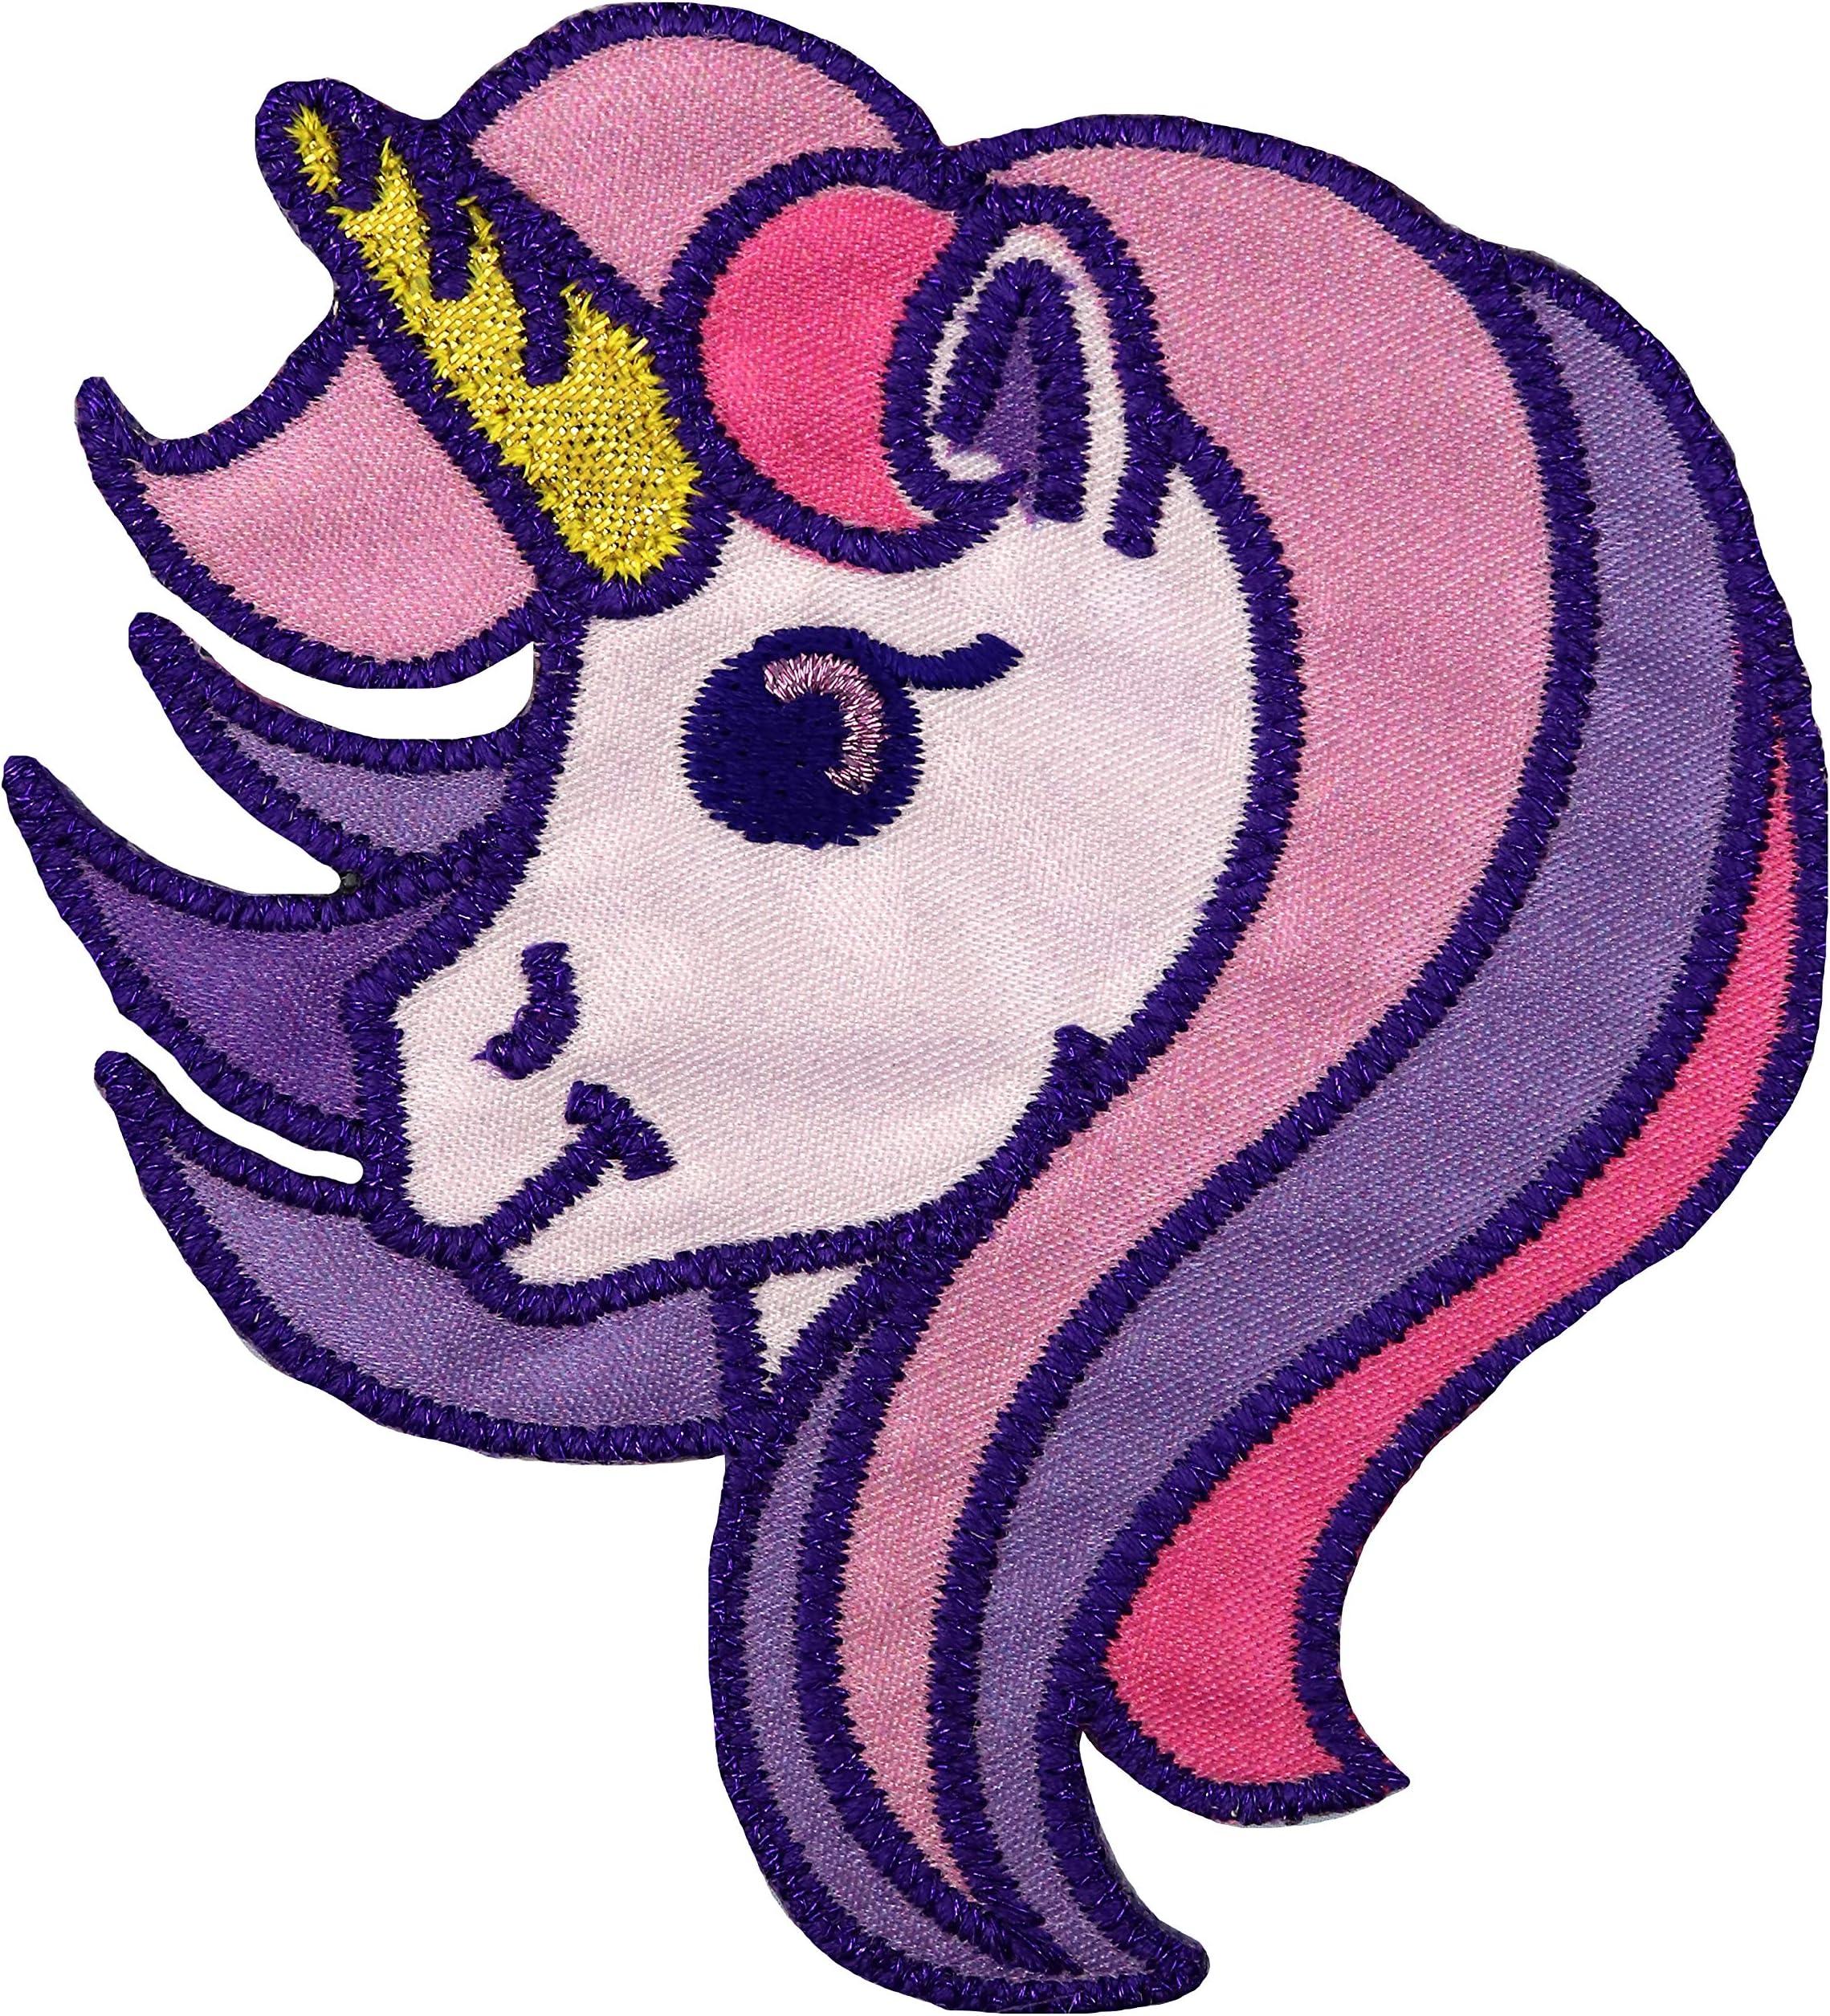 Unicorn Applique Unicorn Iron On Patch Childrens Patch Unicorn Patch Unicorns Girl Patch Children Unicorn Iron On Patch